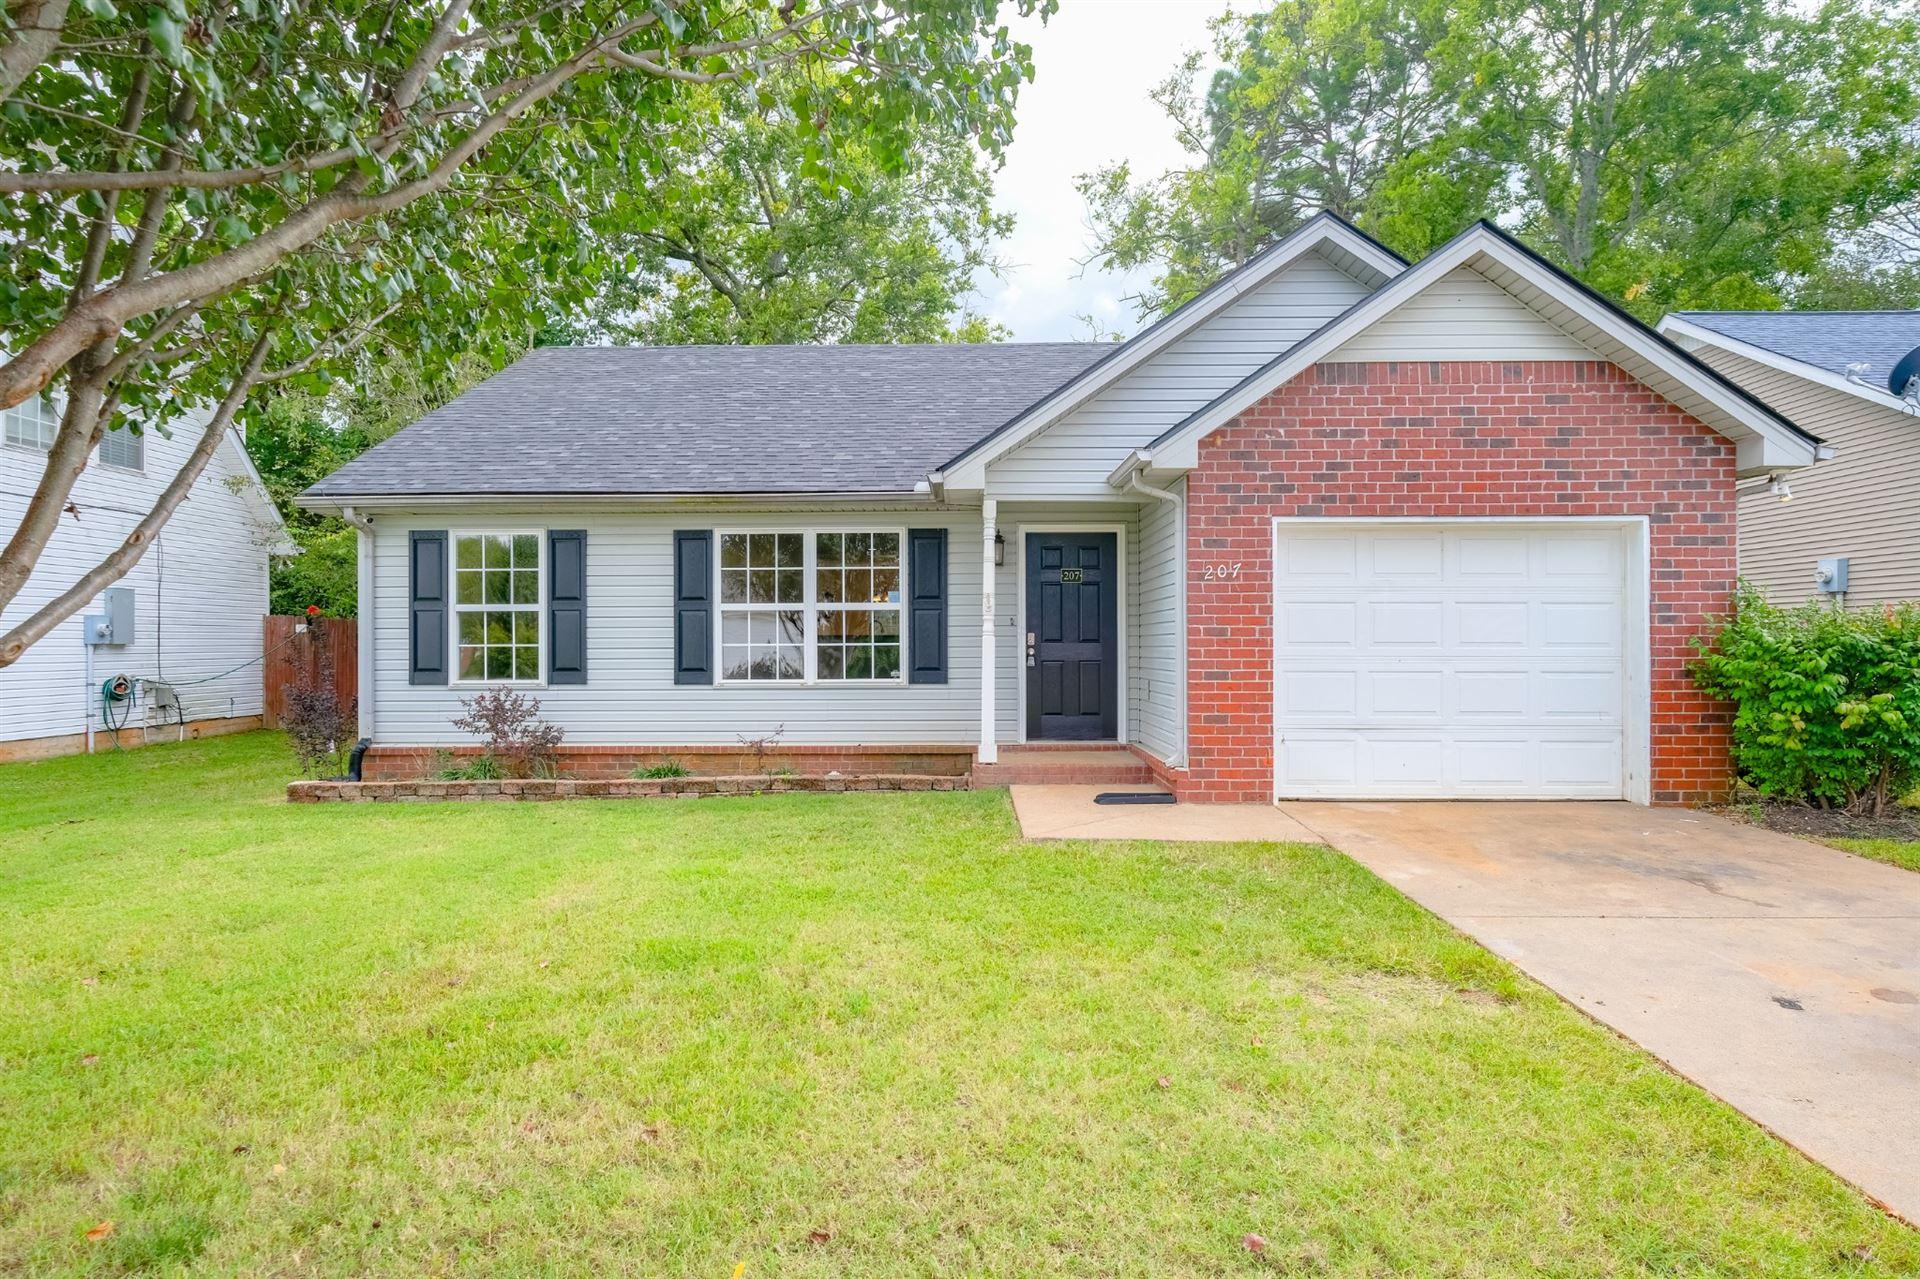 207 Meigs Dr, Murfreesboro, TN 37128 - MLS#: 2292243